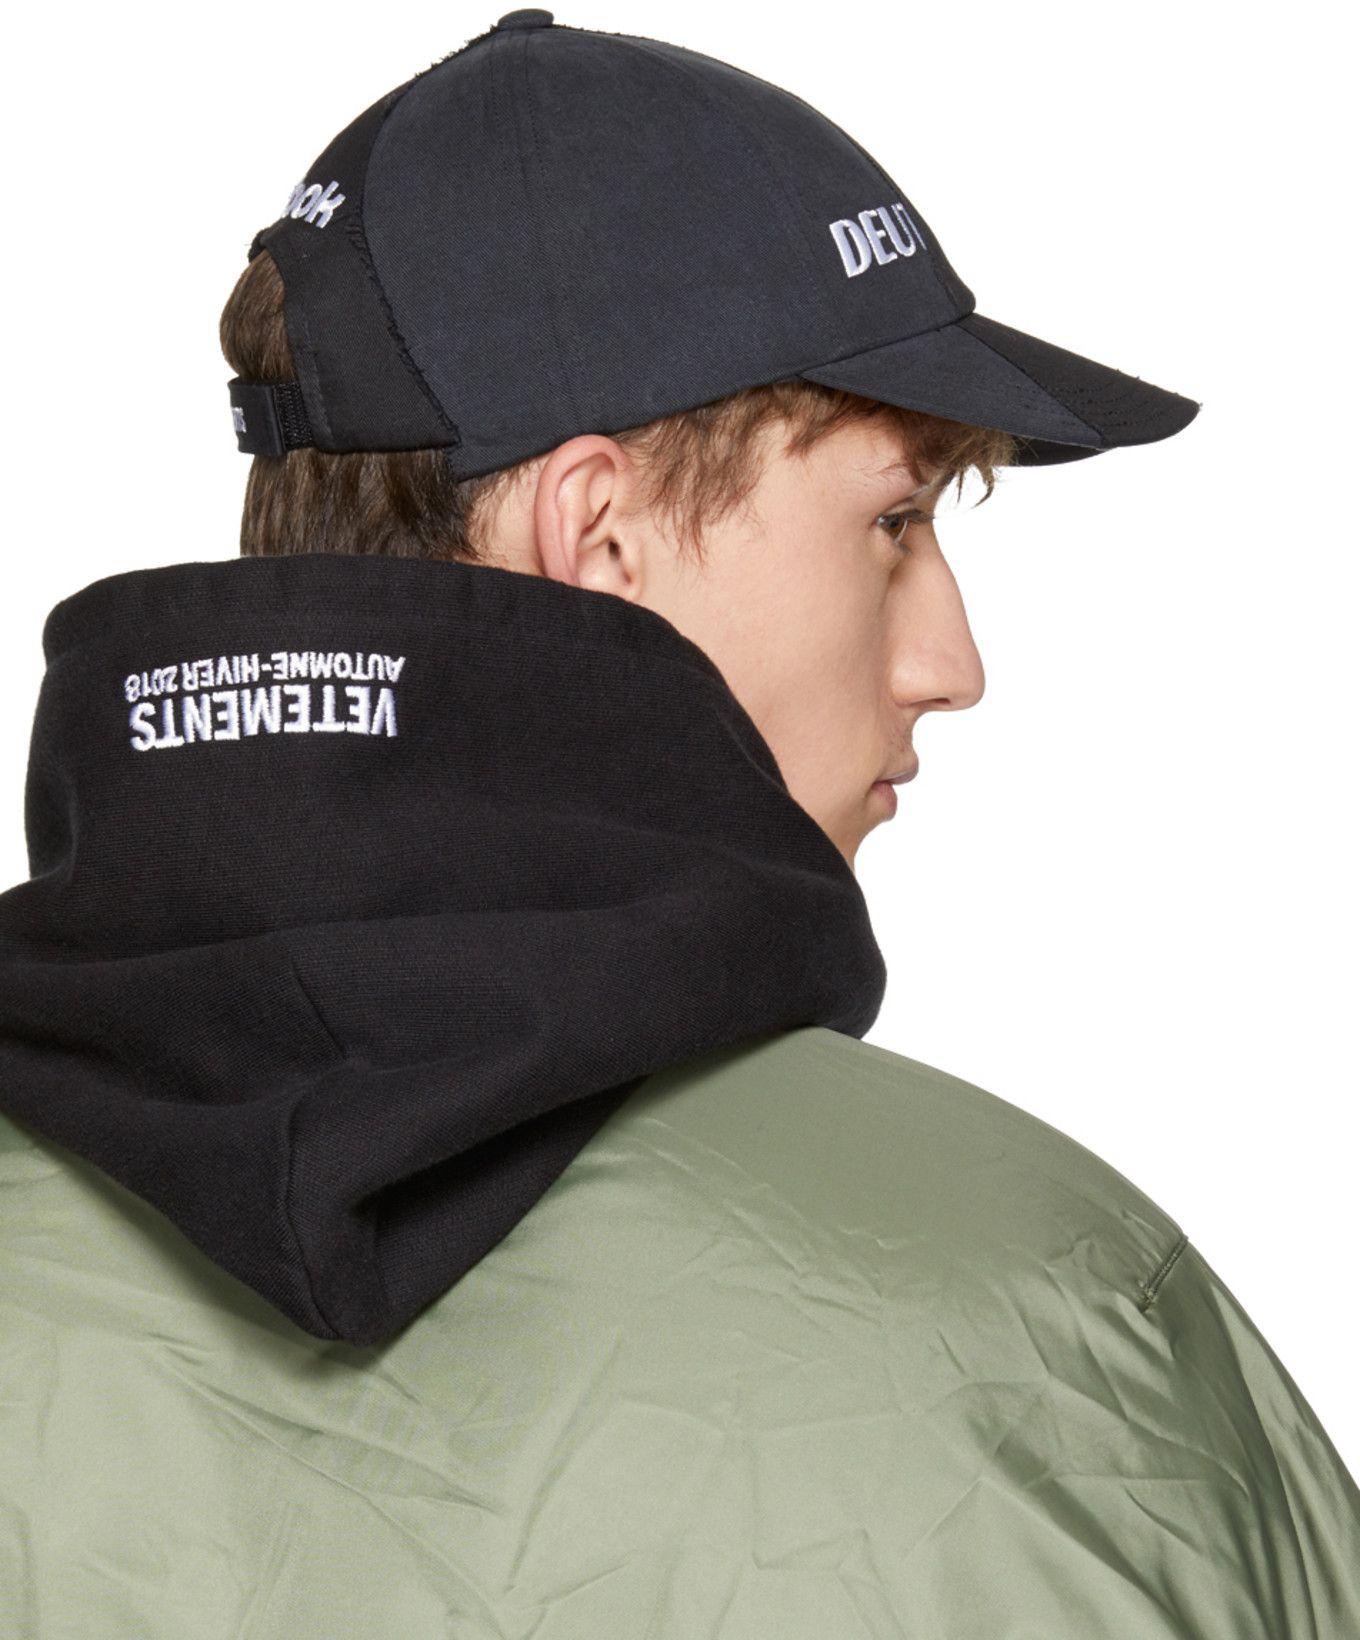 763d696de24bcf Vetements - Black Reebok Edition Reworked Cap | headwear | Black ...